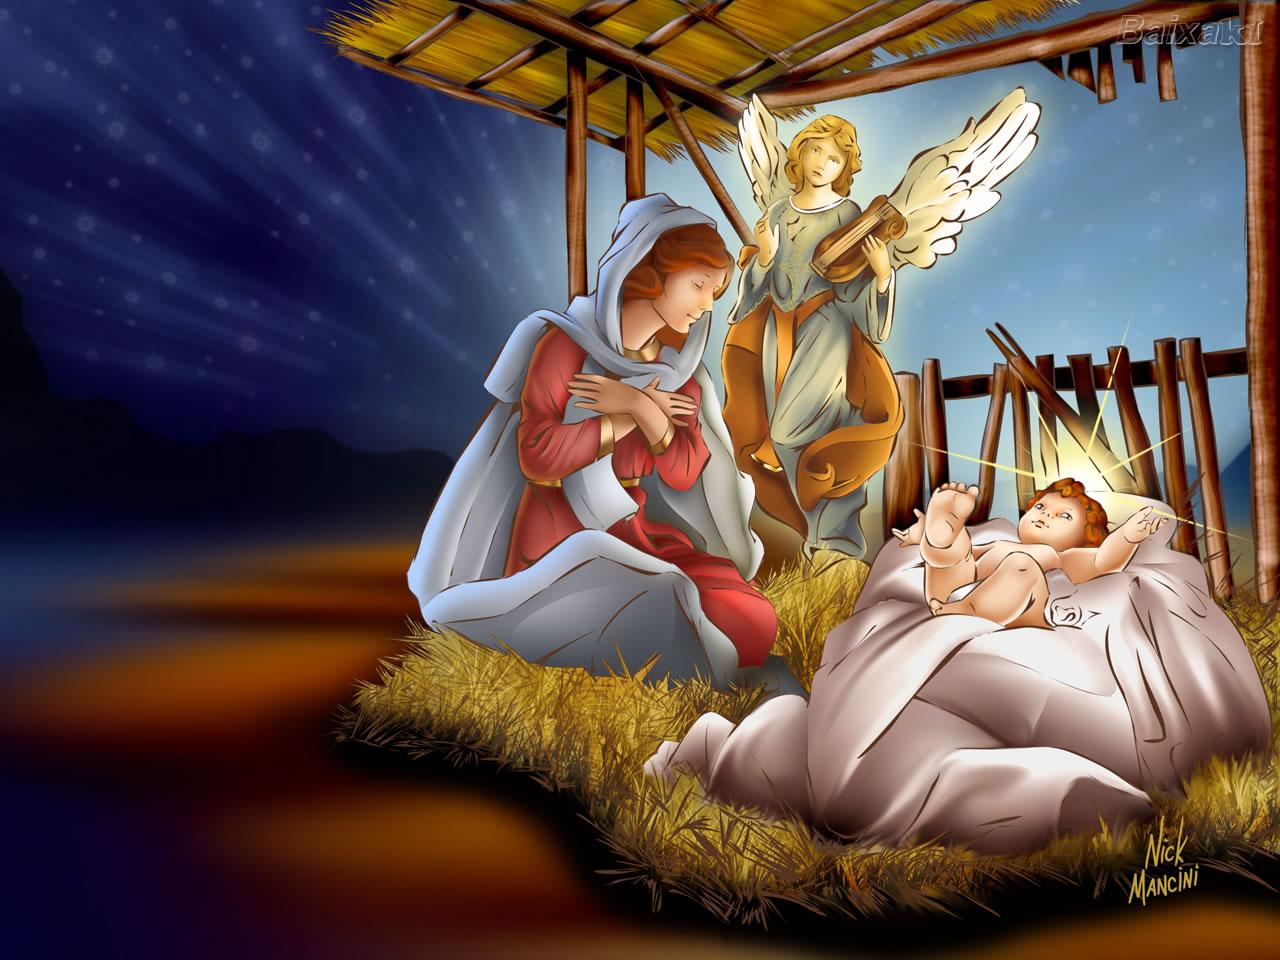 http://4.bp.blogspot.com/-_gx4oBwRYeU/Tt4V1iTiUJI/AAAAAAAAAJM/g3S46AVD5XM/s1600/papel-de-parede-natal-menino-Jesus.jpg